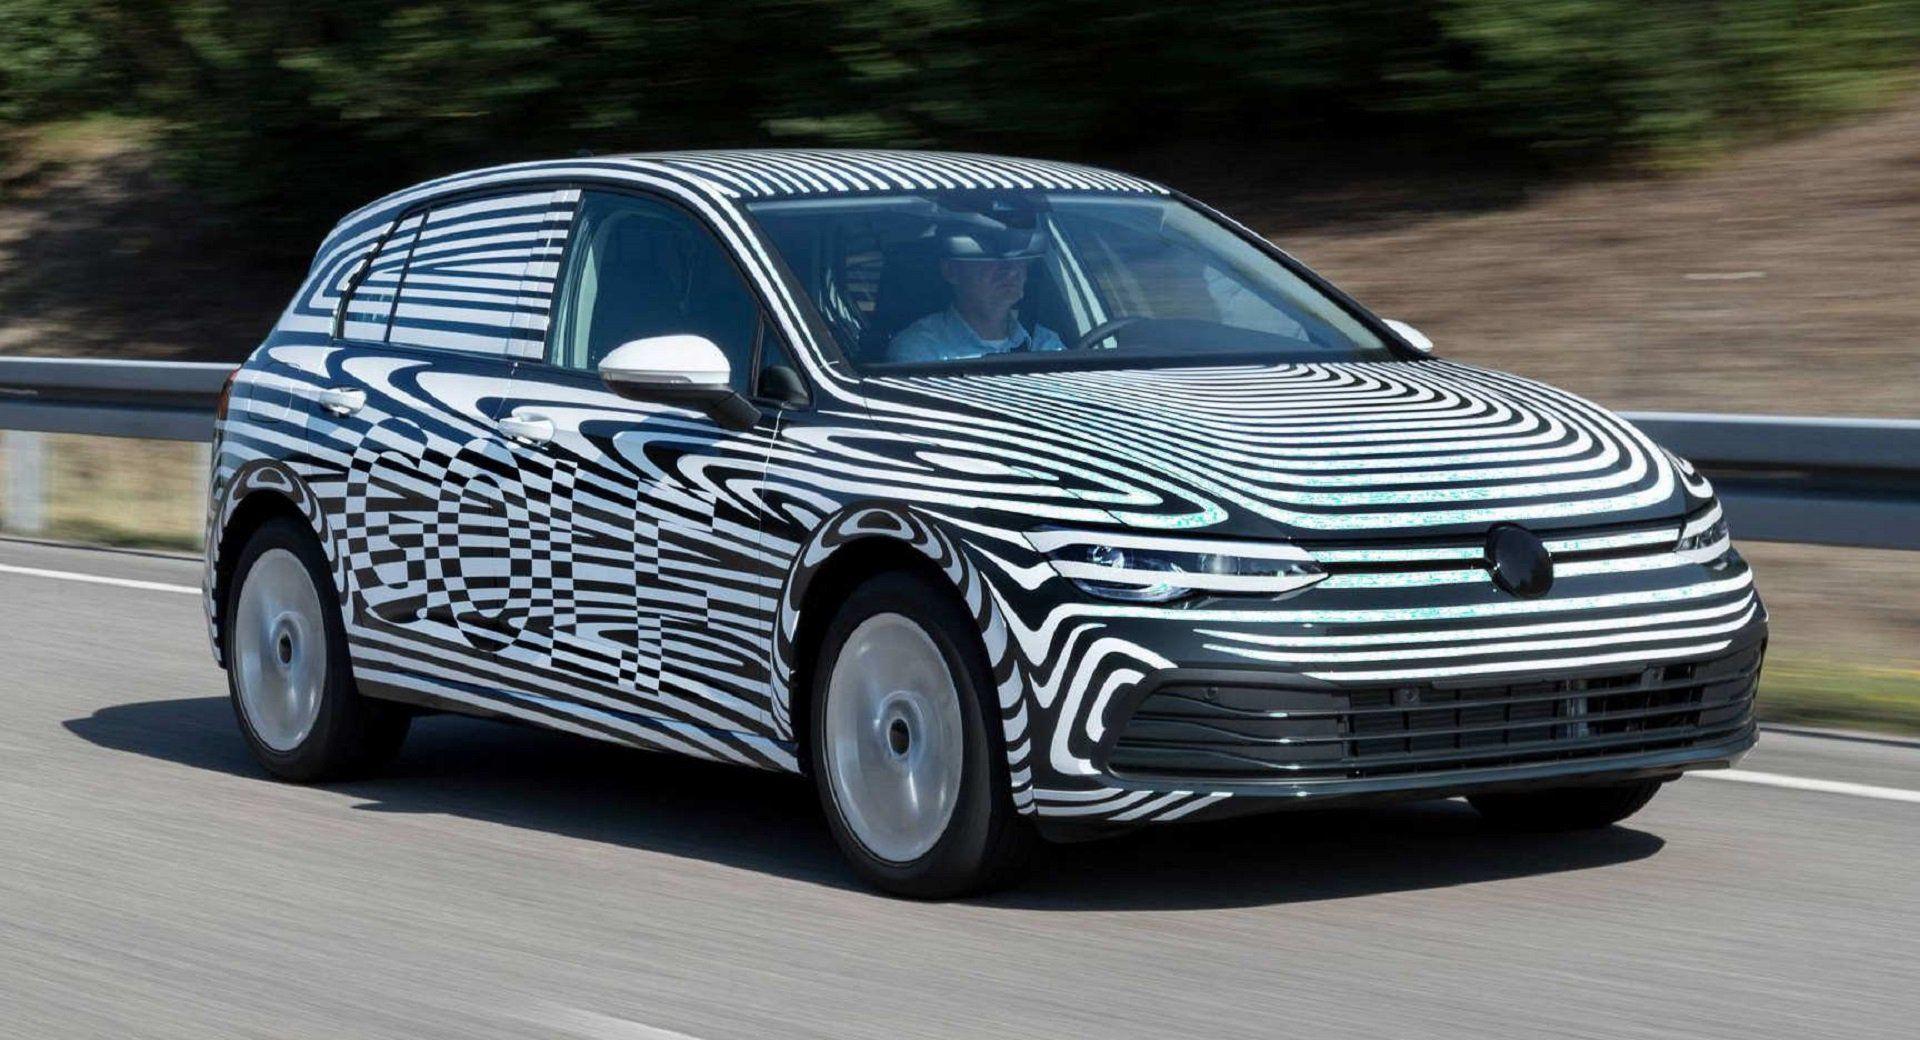 Canada Getting Base Vw Golf Mk8 Will Keep Mk7 Wagons Through 2020 Canada Reports Usa Volkswagen Vw Vwgolf Cars Cars Volkswagen Vw Golf Volkswagen Golf